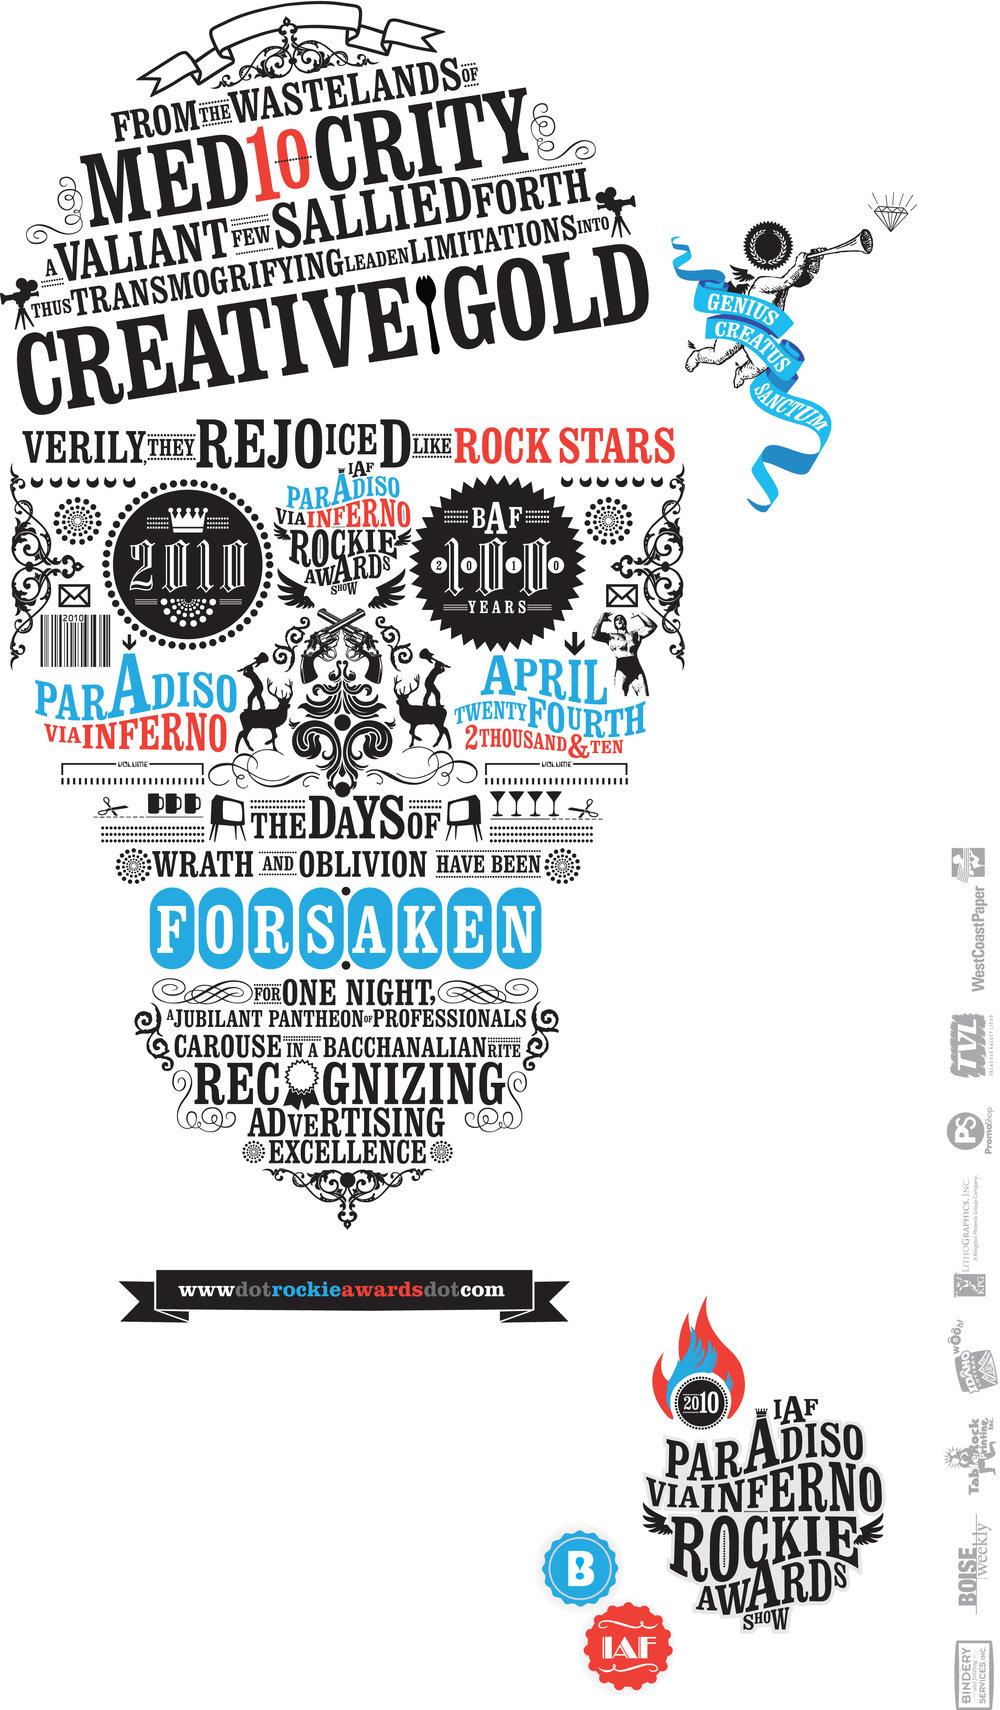 2010_RockiesShow_-Poster.jpg